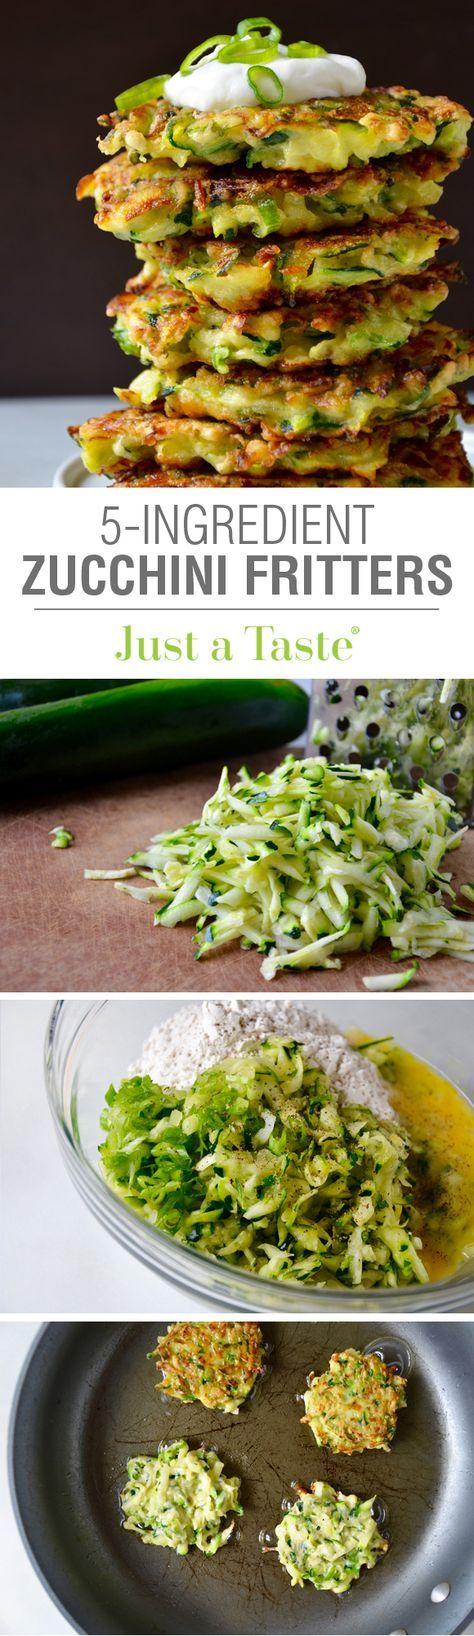 5-Ingredient Zucchini Fritters #recipe via justataste.com Flour, egg, zucchini, scallion. sour cream topping.